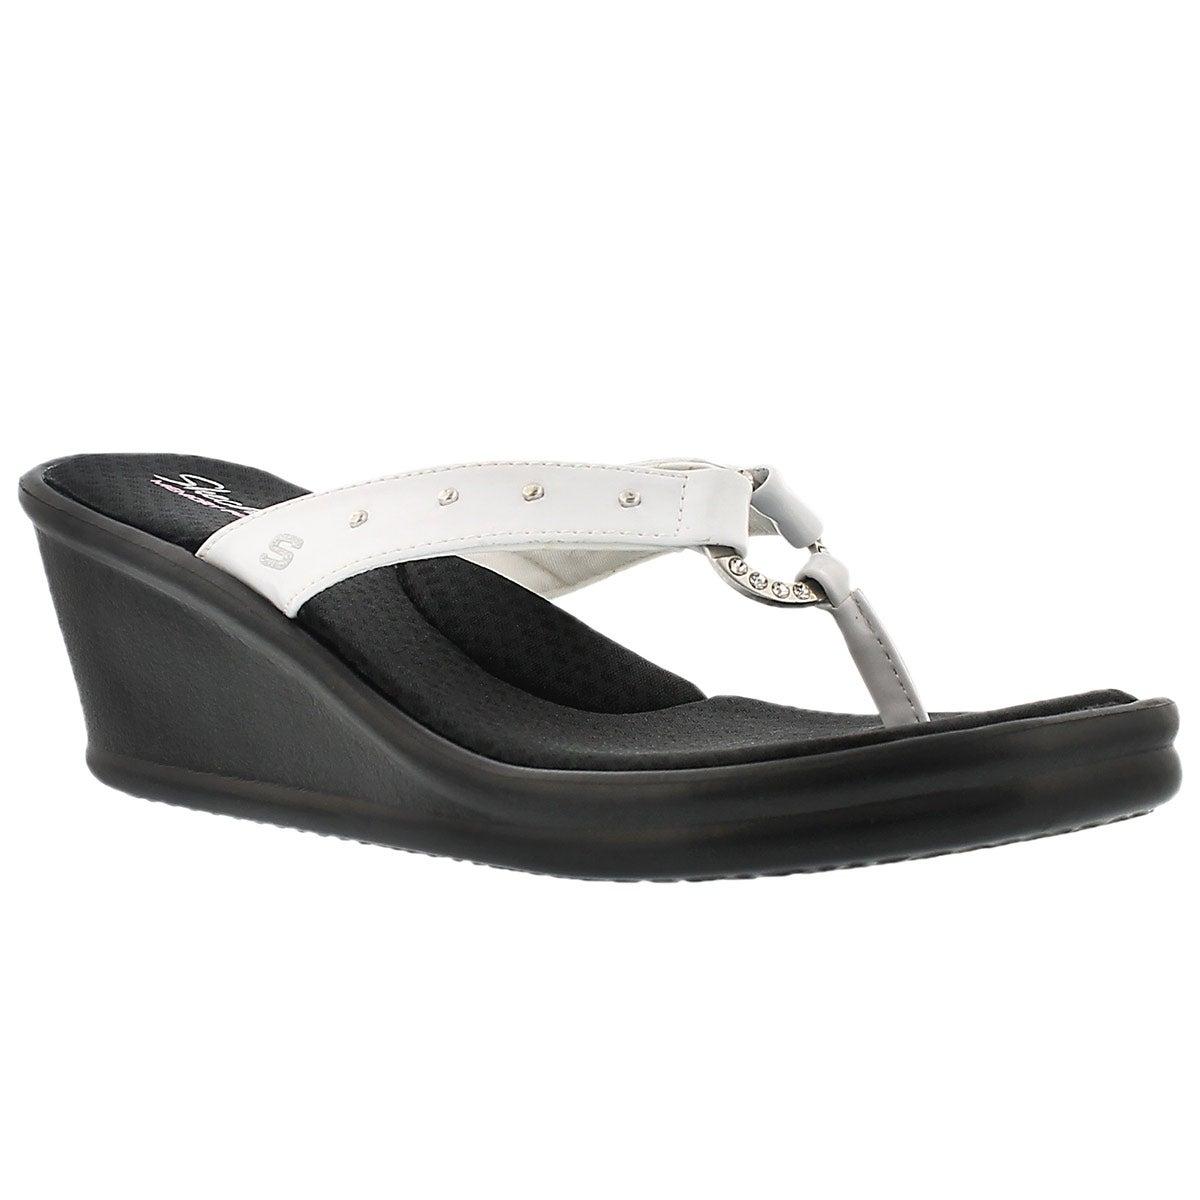 Lds Rumblers wht stud thong wedge sandal